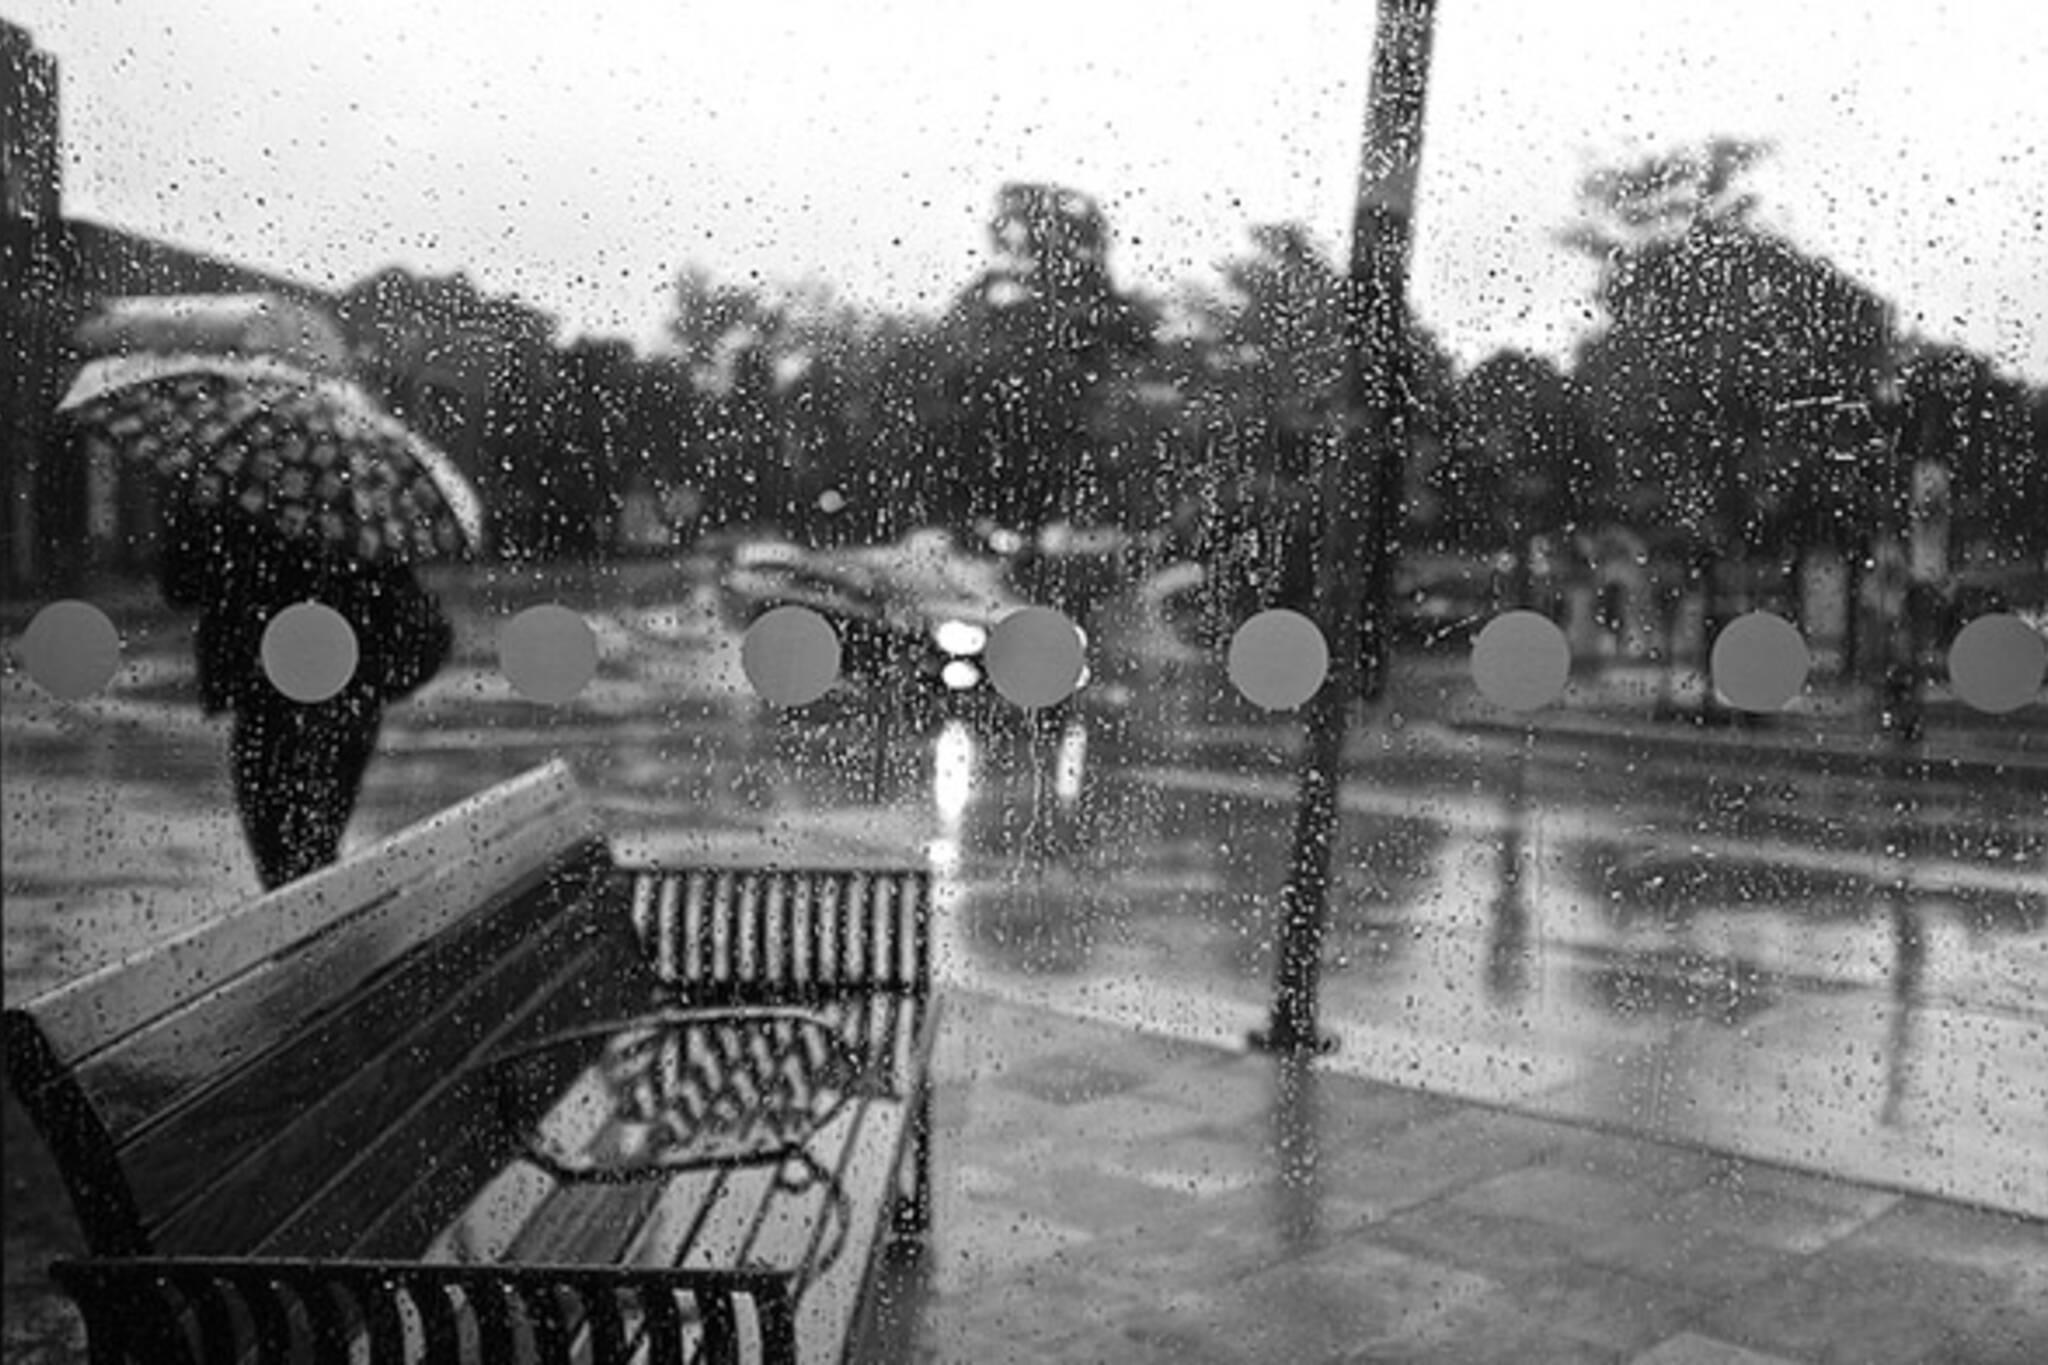 rain, fall, station